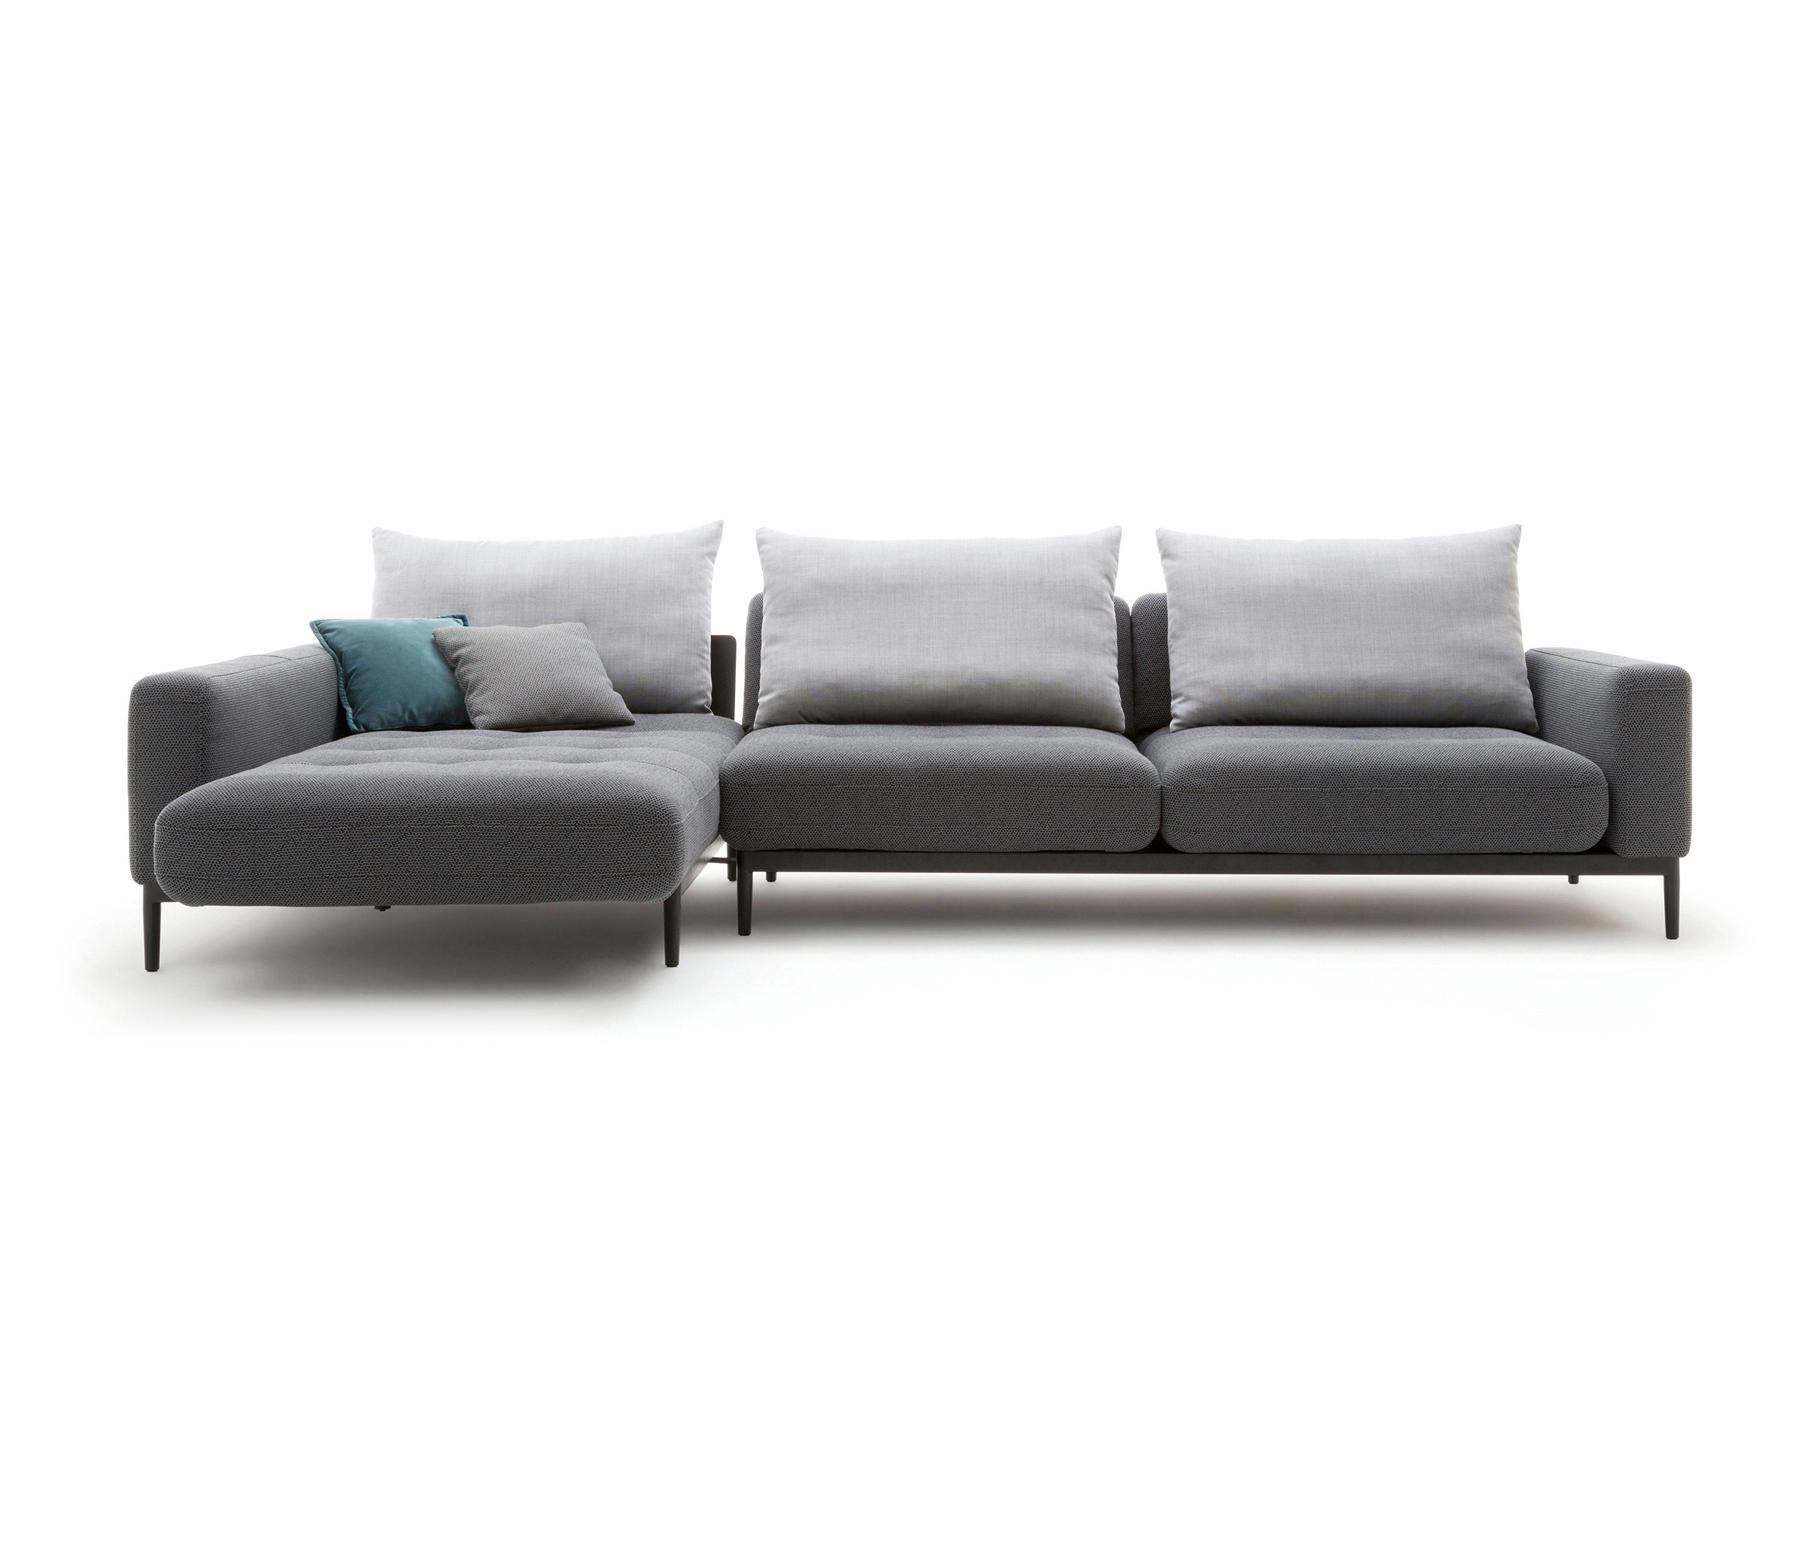 sofa nova rolf benz finest rolf benz mera sofa with sofa. Black Bedroom Furniture Sets. Home Design Ideas